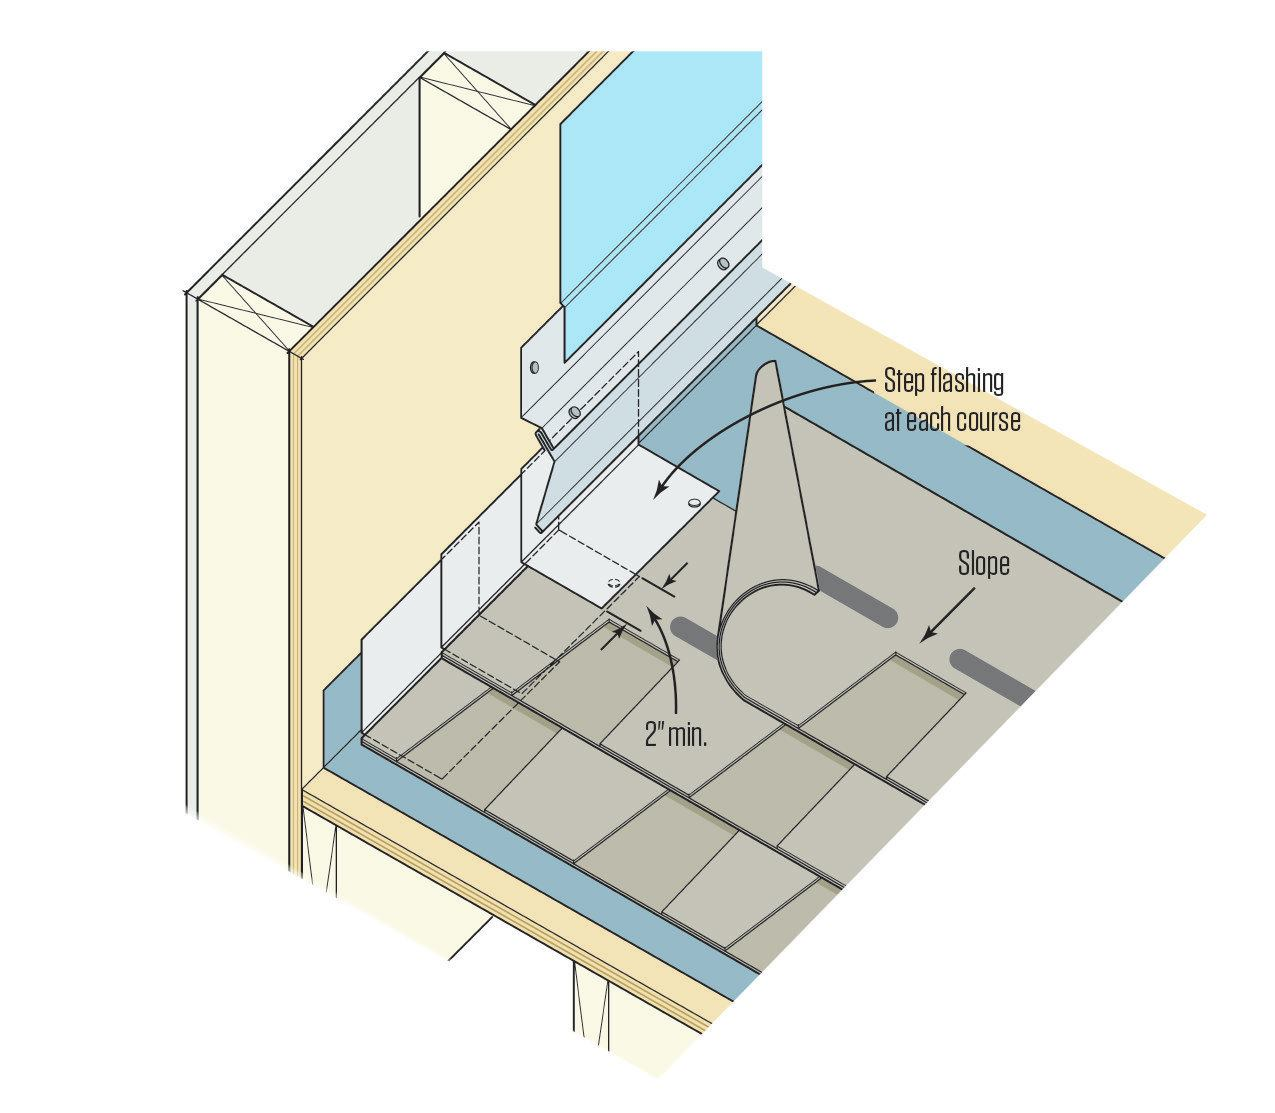 International Building Code Diagrams Step Flashing Vs Continuous Flashing Jlc Online